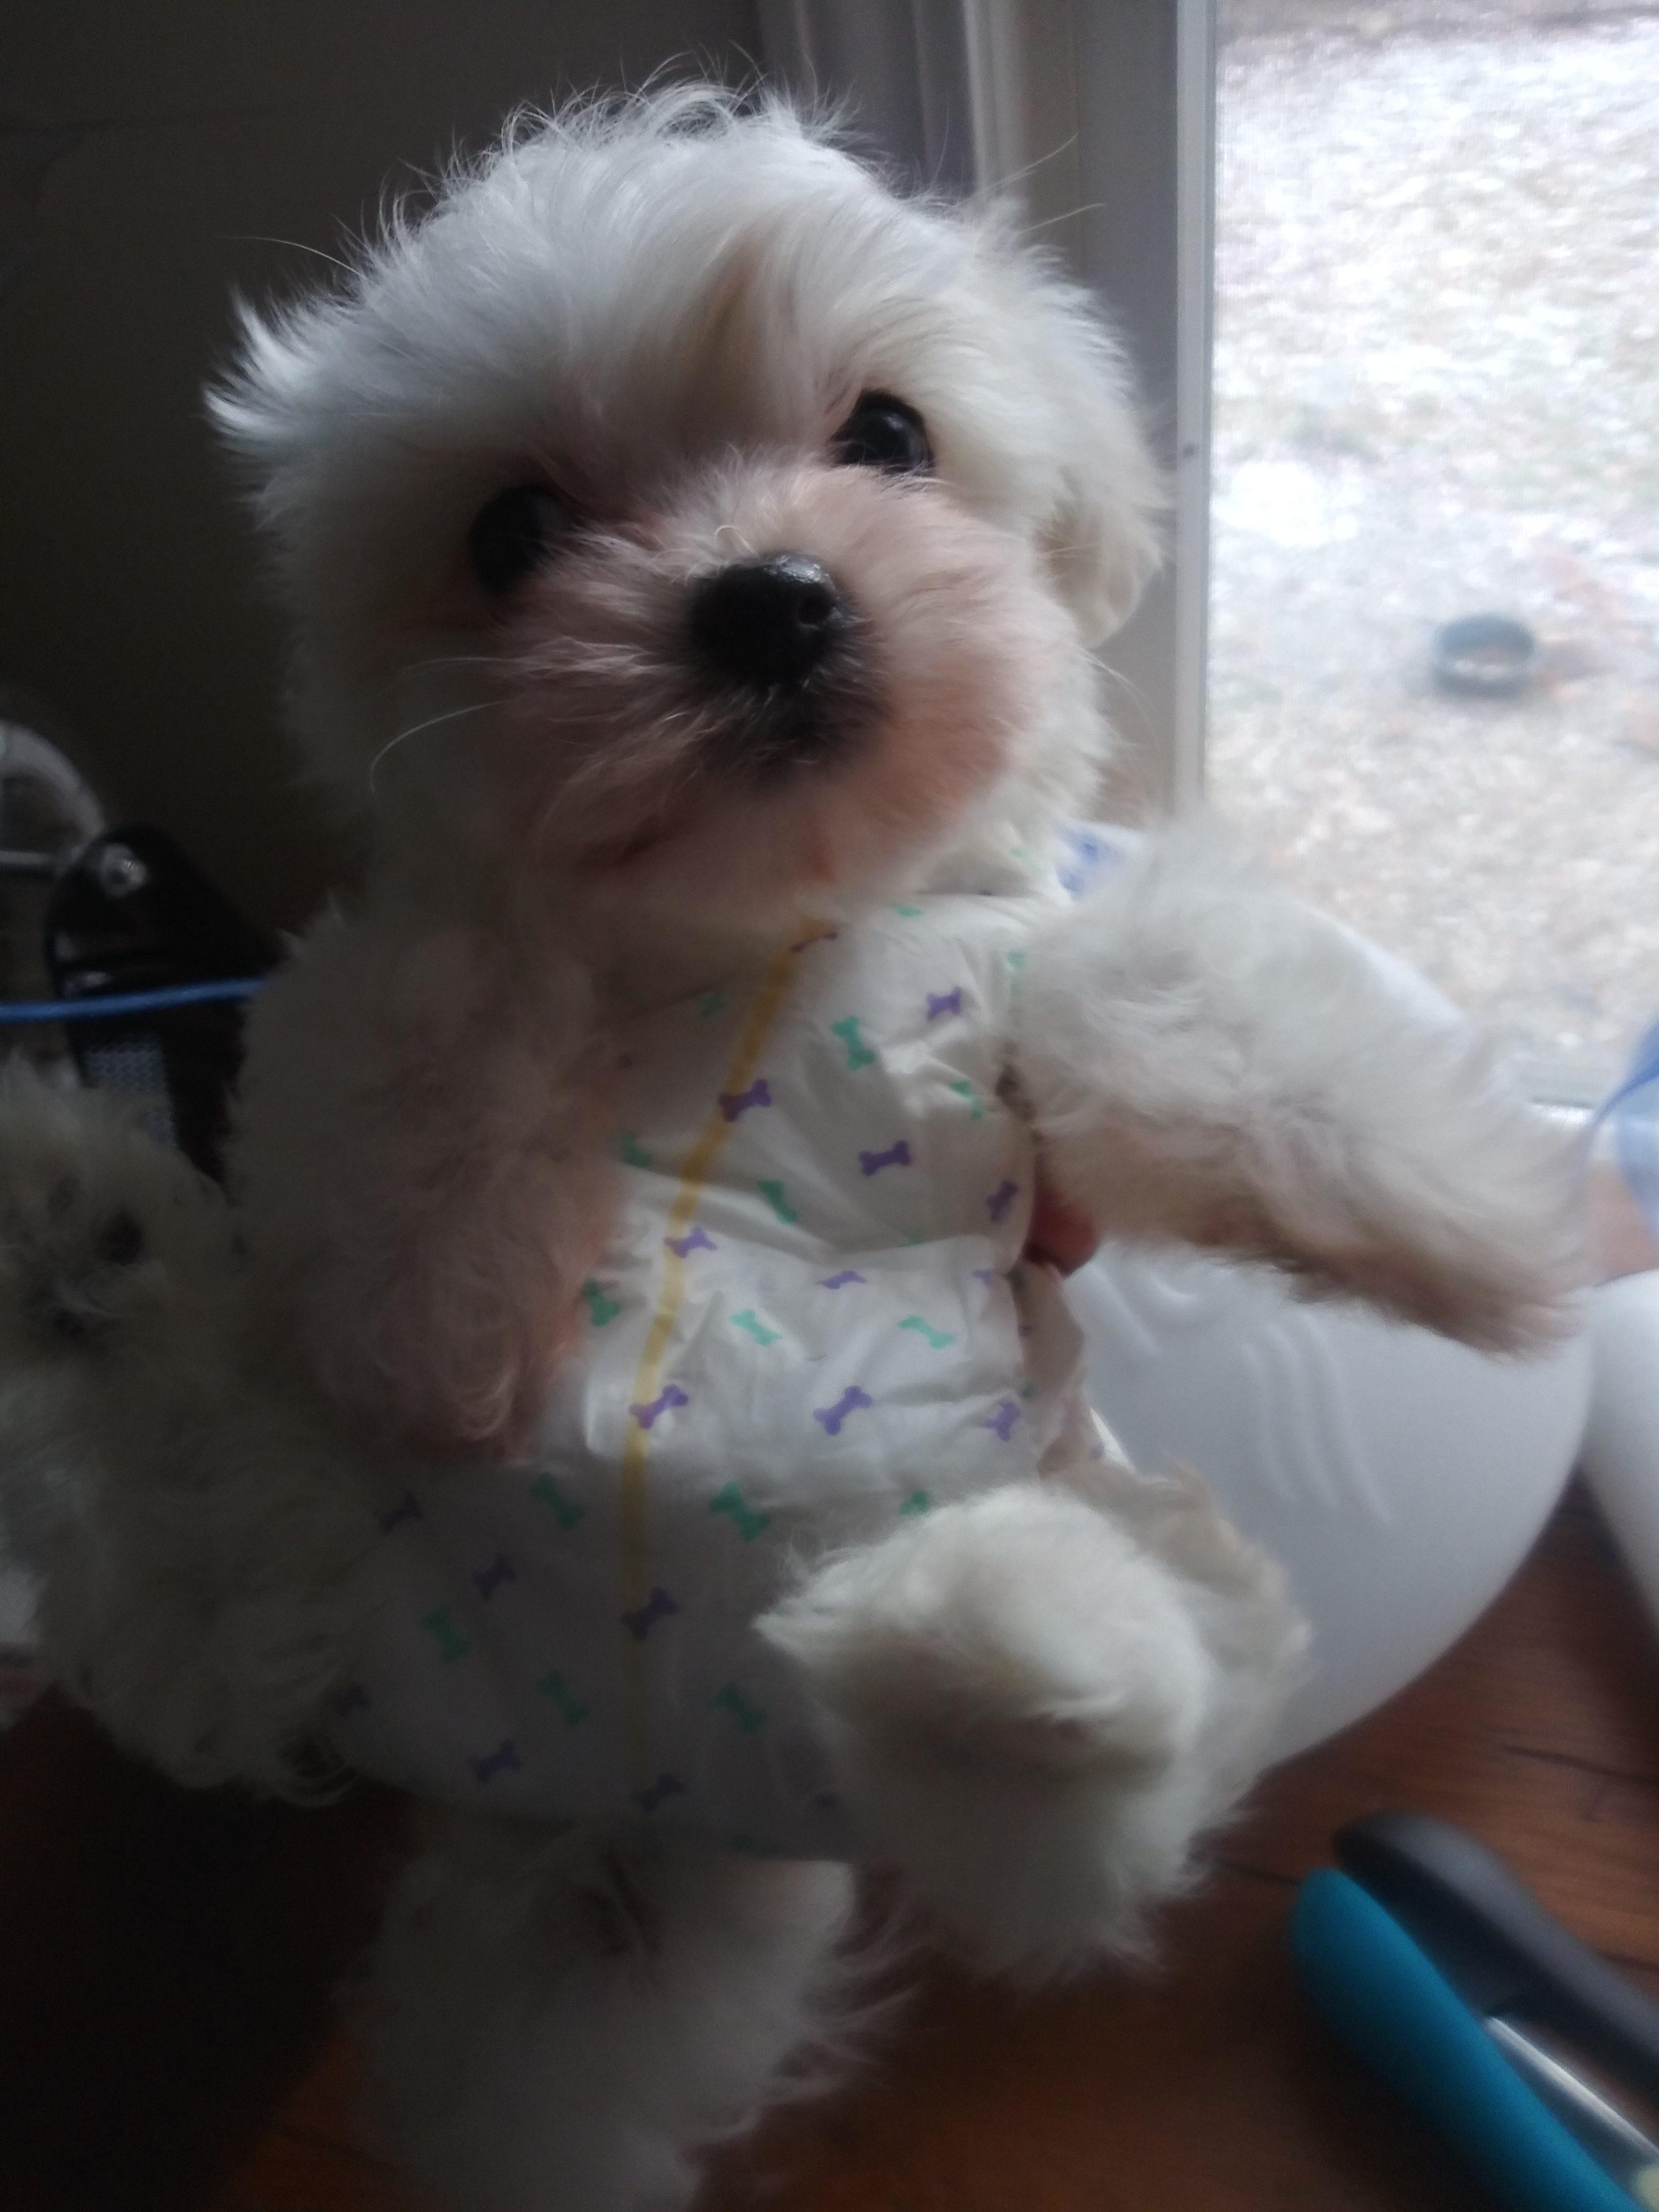 Nugget Akc Coton De Tulear Puppy For Sale At Flint Michigan